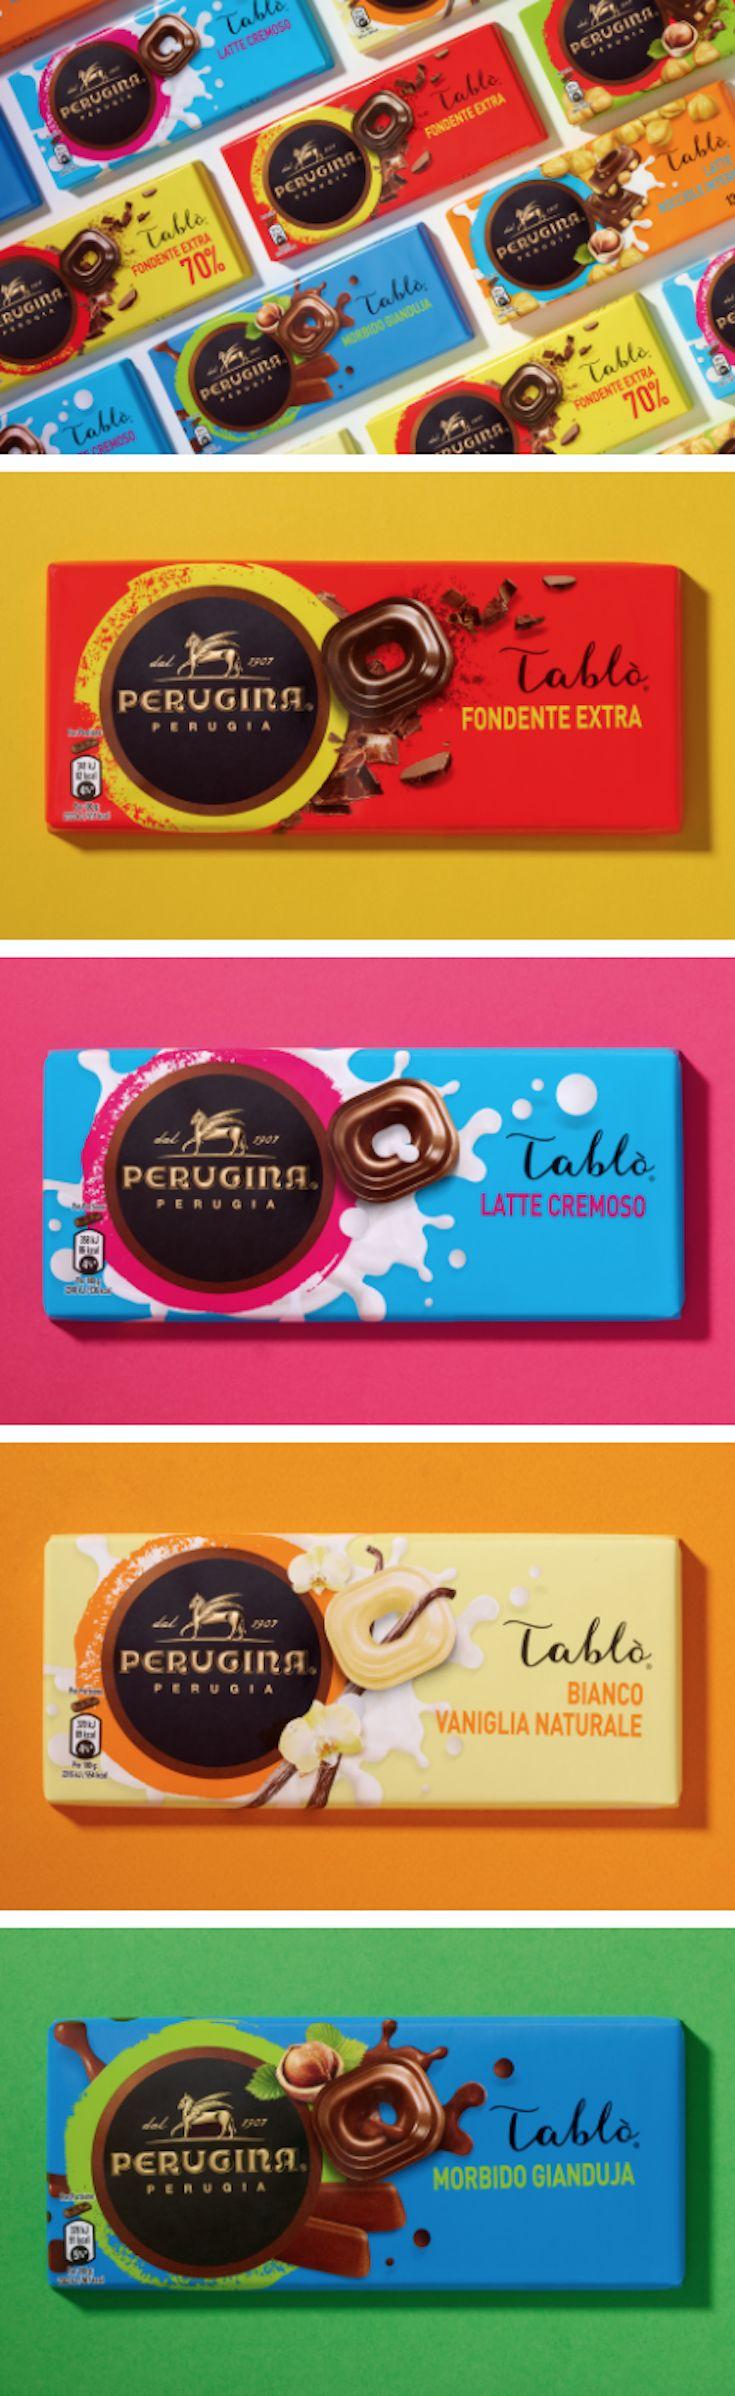 Top 25+ best Chocolate packaging ideas on Pinterest   Packaging ...